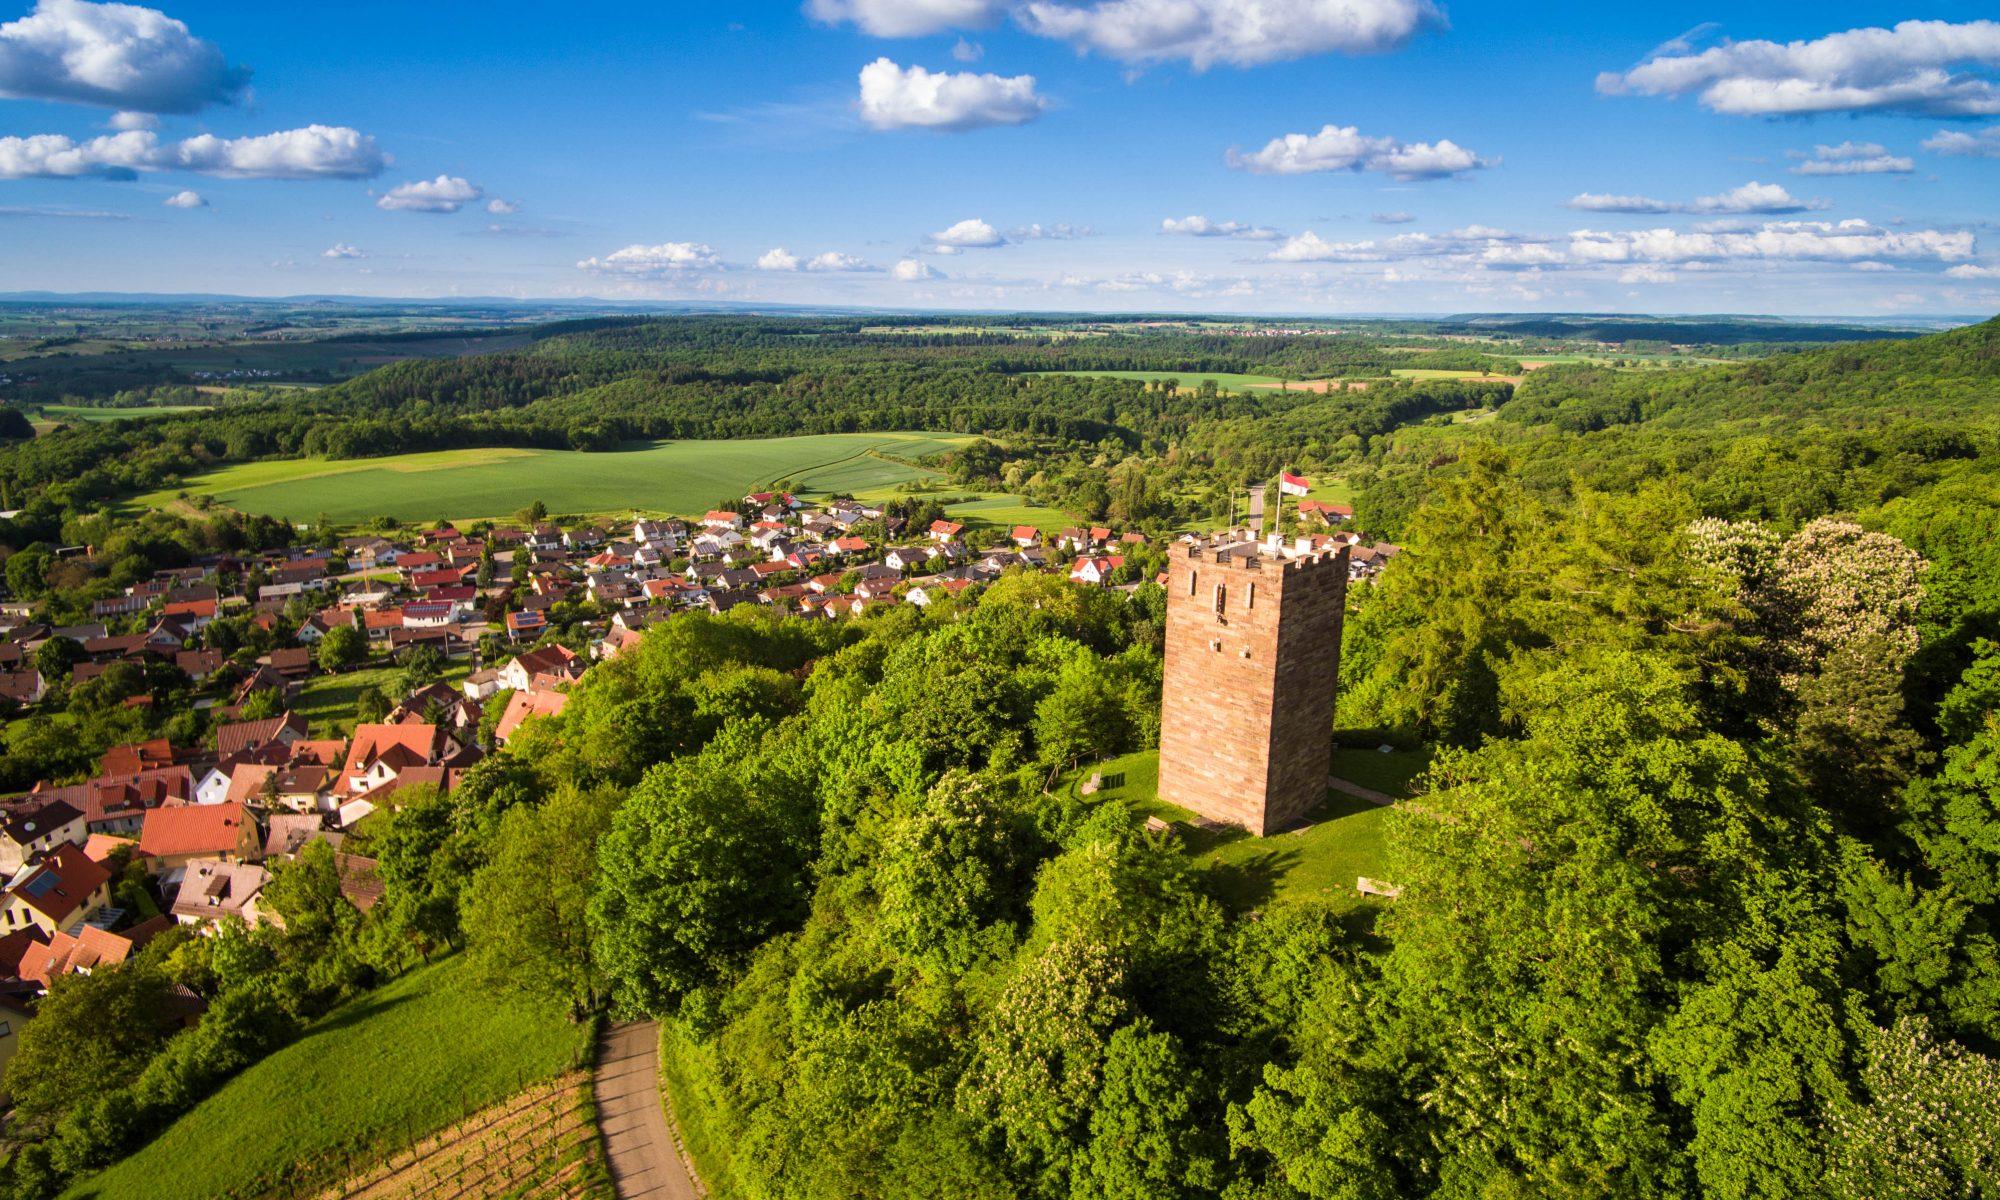 Luftbild Schlossberg Turm Sternenfels